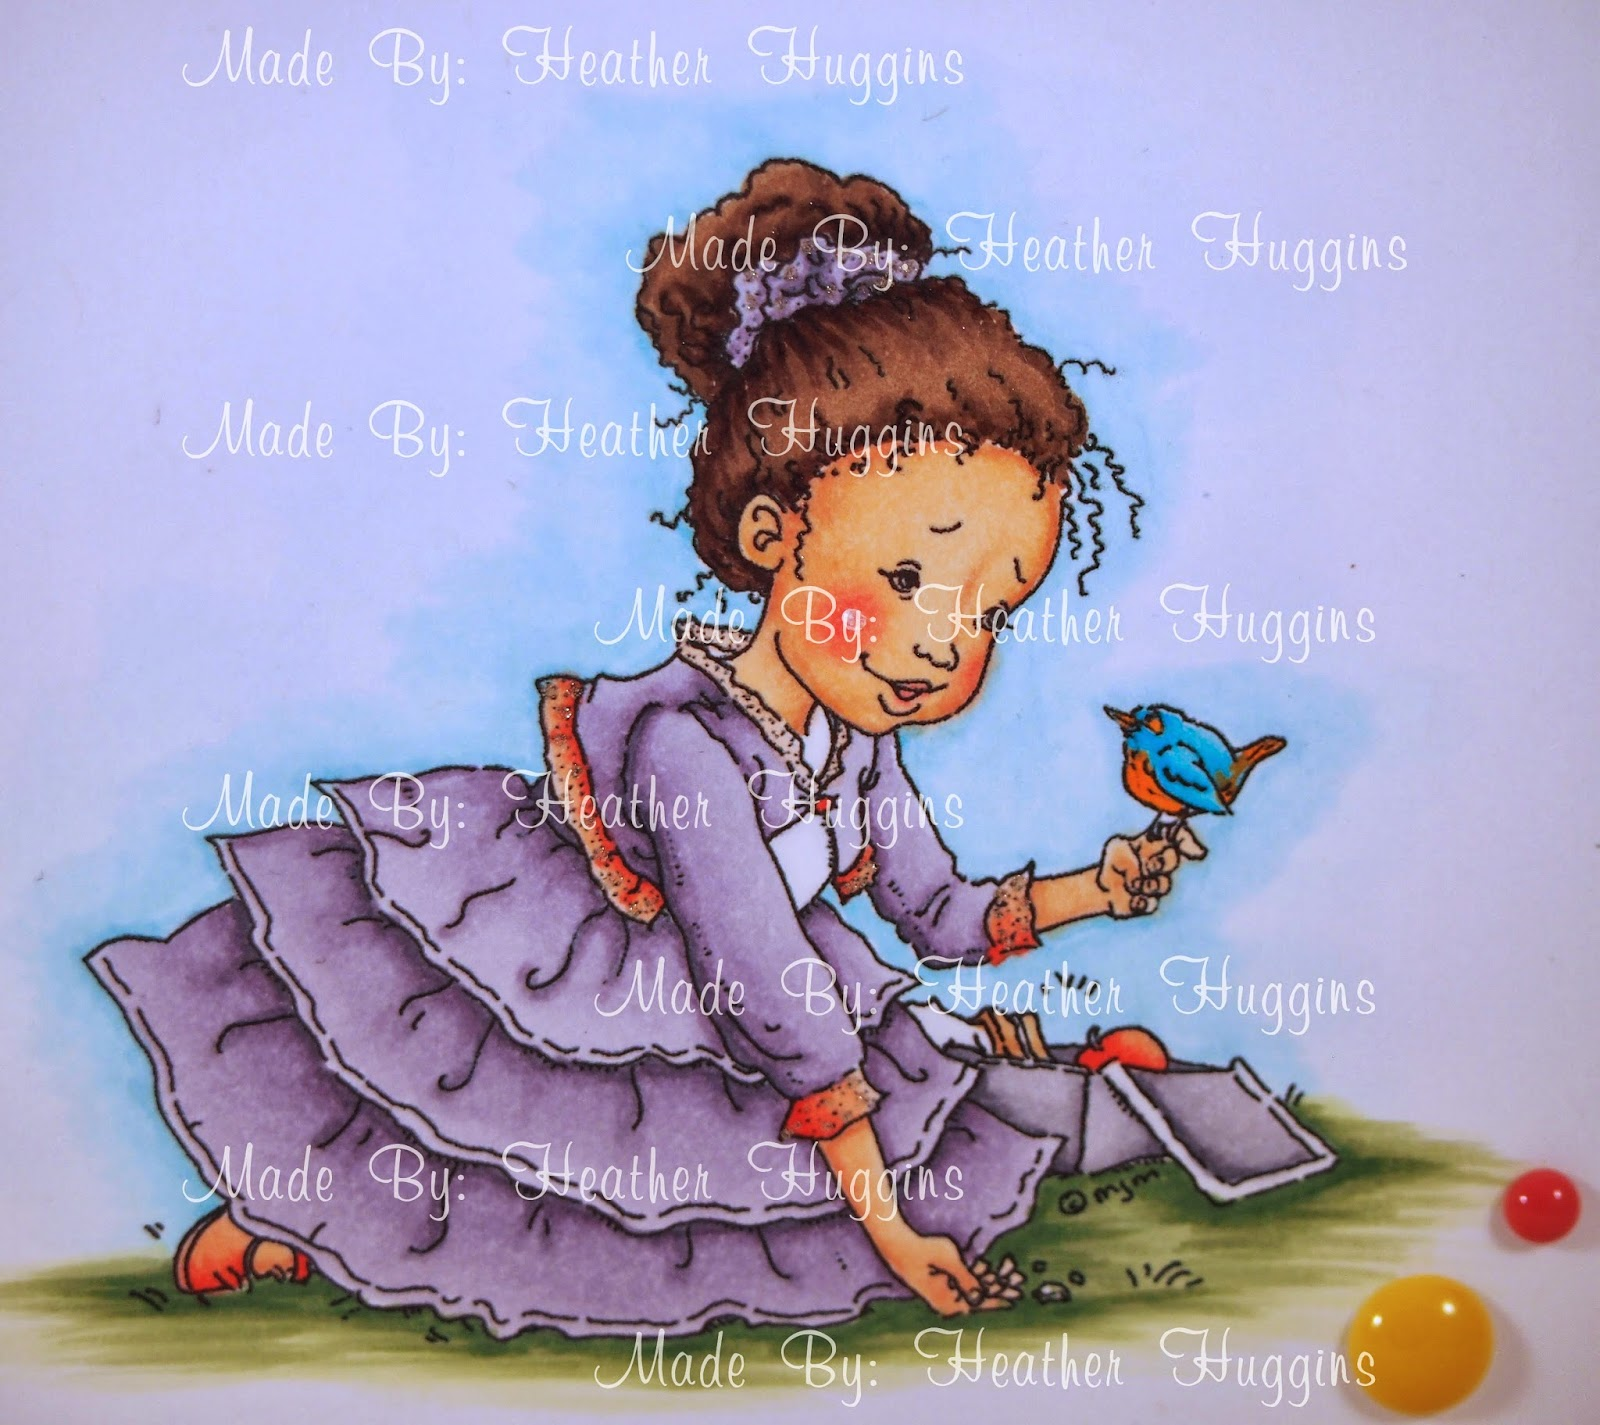 Heather's Hobbie Haven - Outline: B01, B00, B000, B0000, Colorless Blender Ground: G24, G21, G20 Skin: E11, E21, E00, E000 Cheeks: R43, R20, R30 Hair: E49, E47, E44, E43 Skirt/Sweater/Hair Tie: V28, V25, V22, V20 Sweater Accents/Shoe/Apple: R14, R12, R11 Bird: B02, B01, YR16 Lunch Box: C5, C3, C1, C00 Sandwich: E53 Shirt/Other Item in lunch box: C00